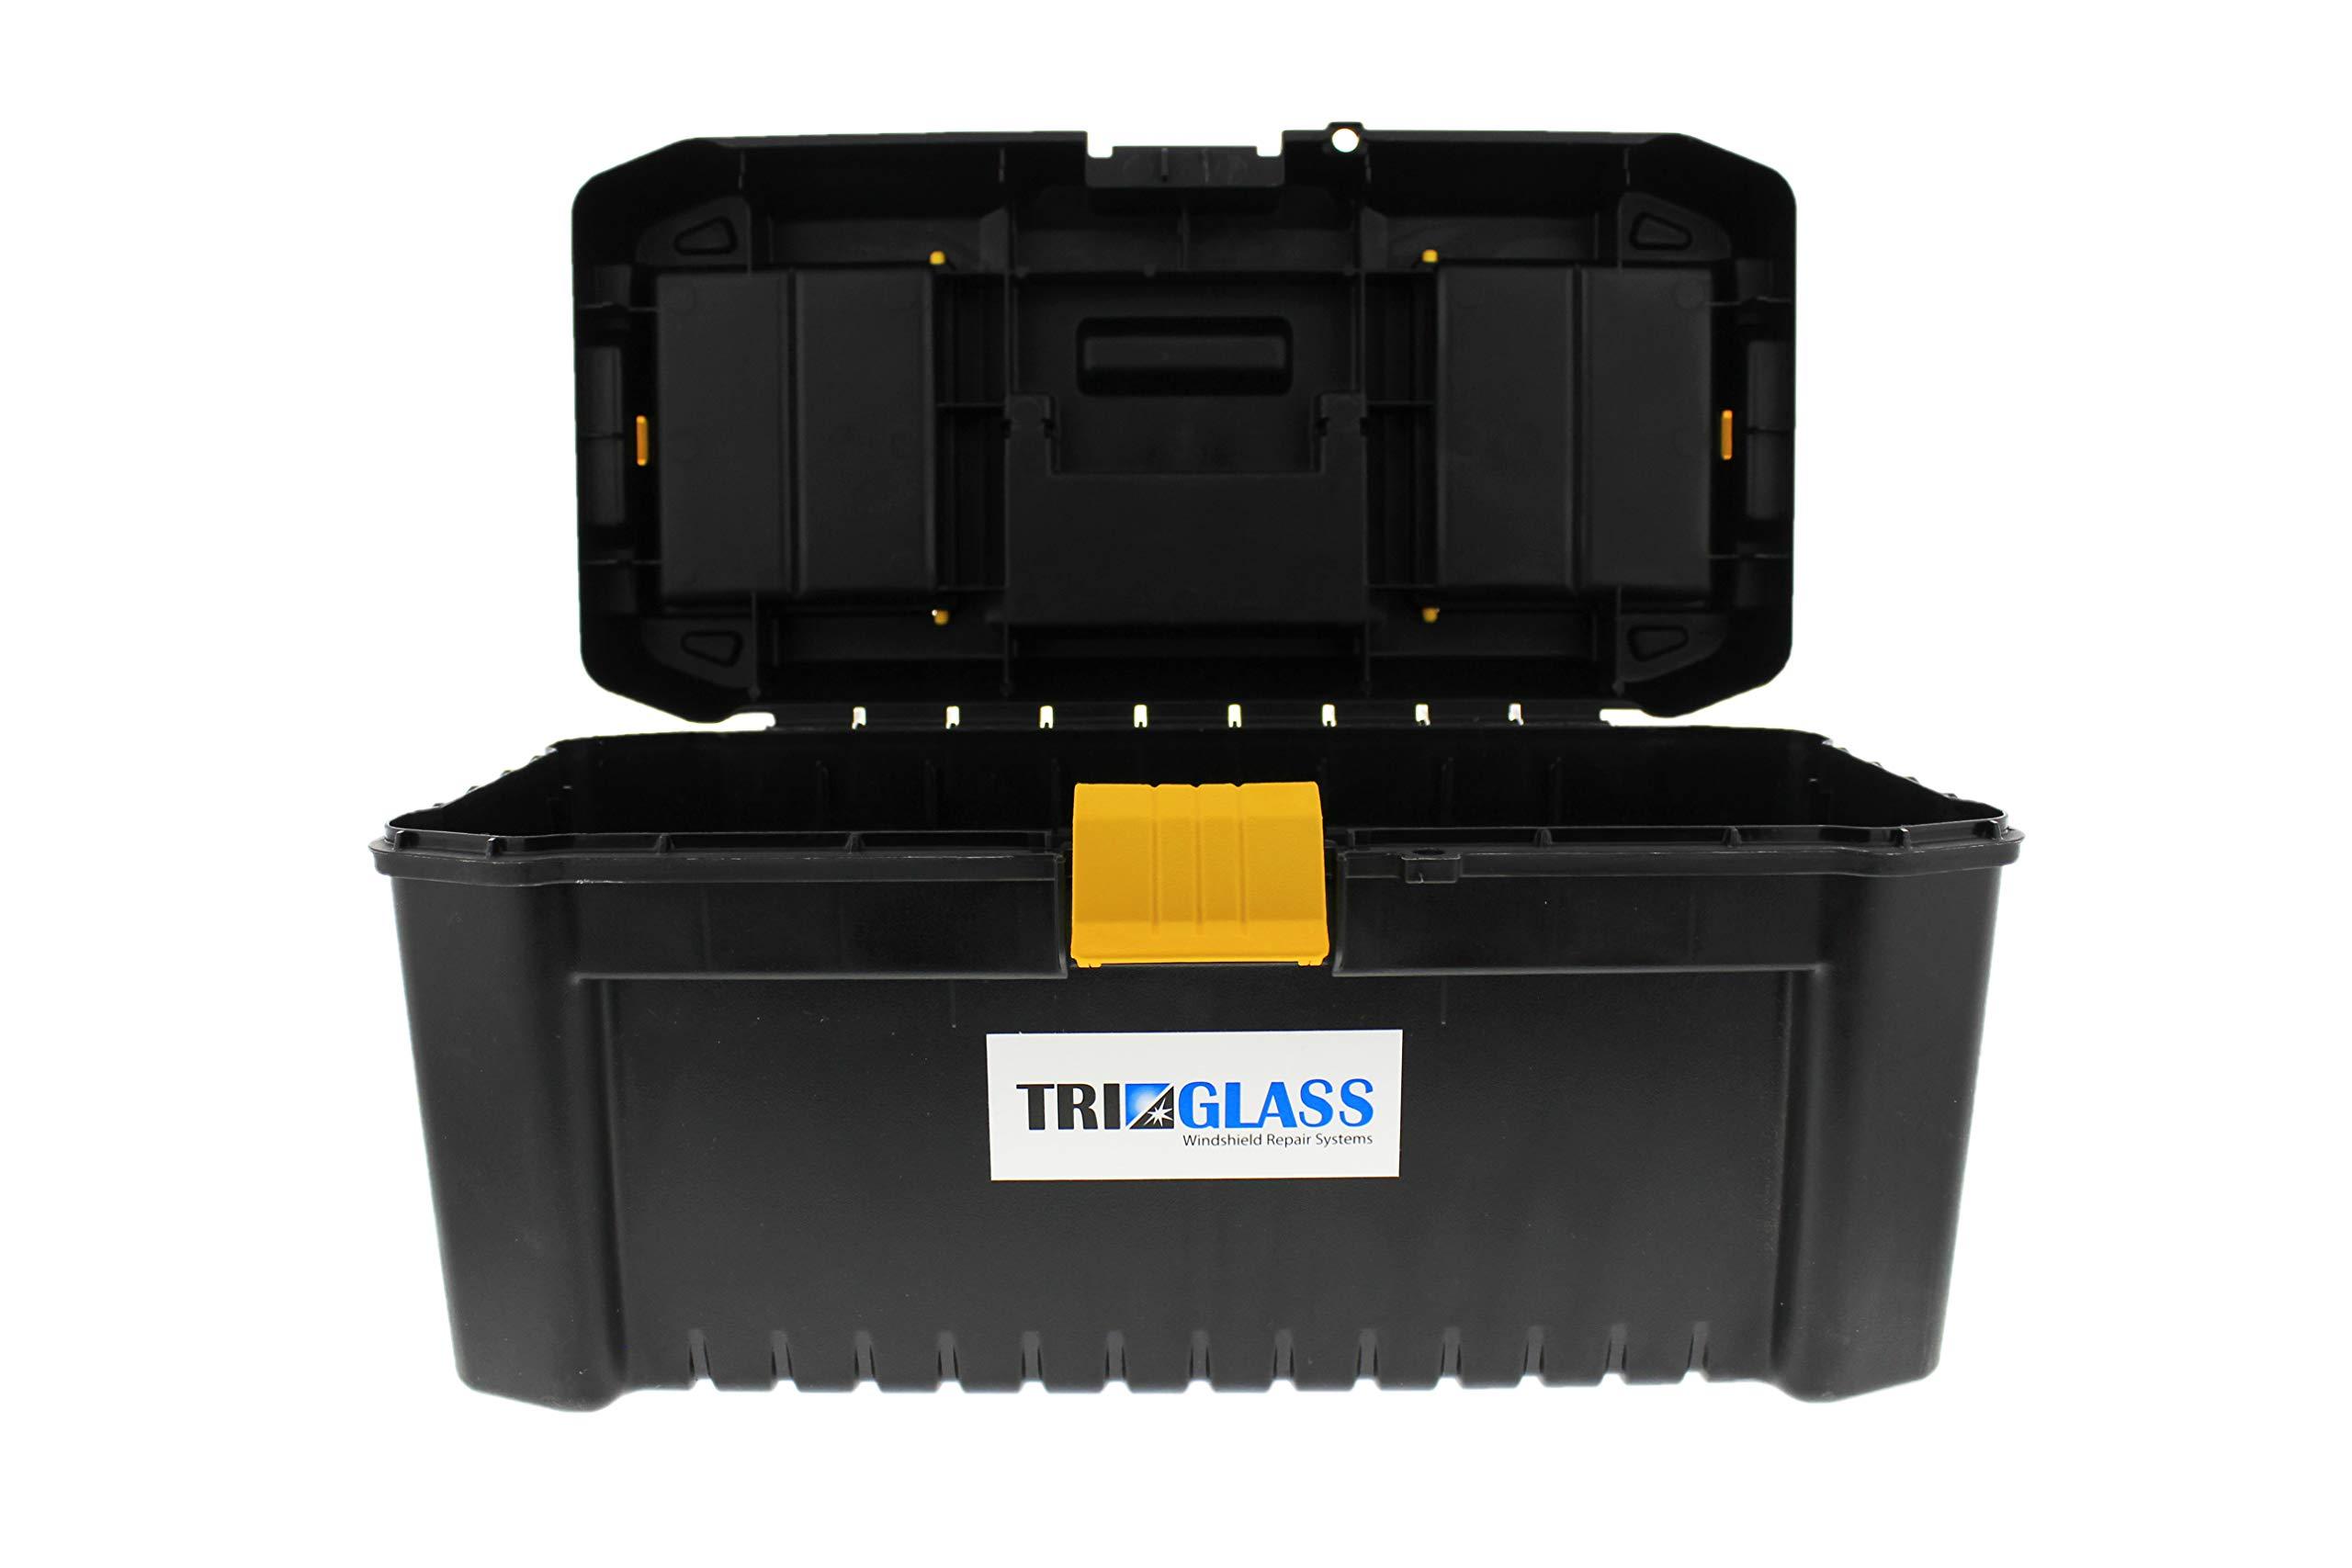 Tri Glass Quality Windshield Repair Kits (Tri Glass TRI 15 Essential Windshield Repair Kit) by Tri Glass (Image #2)